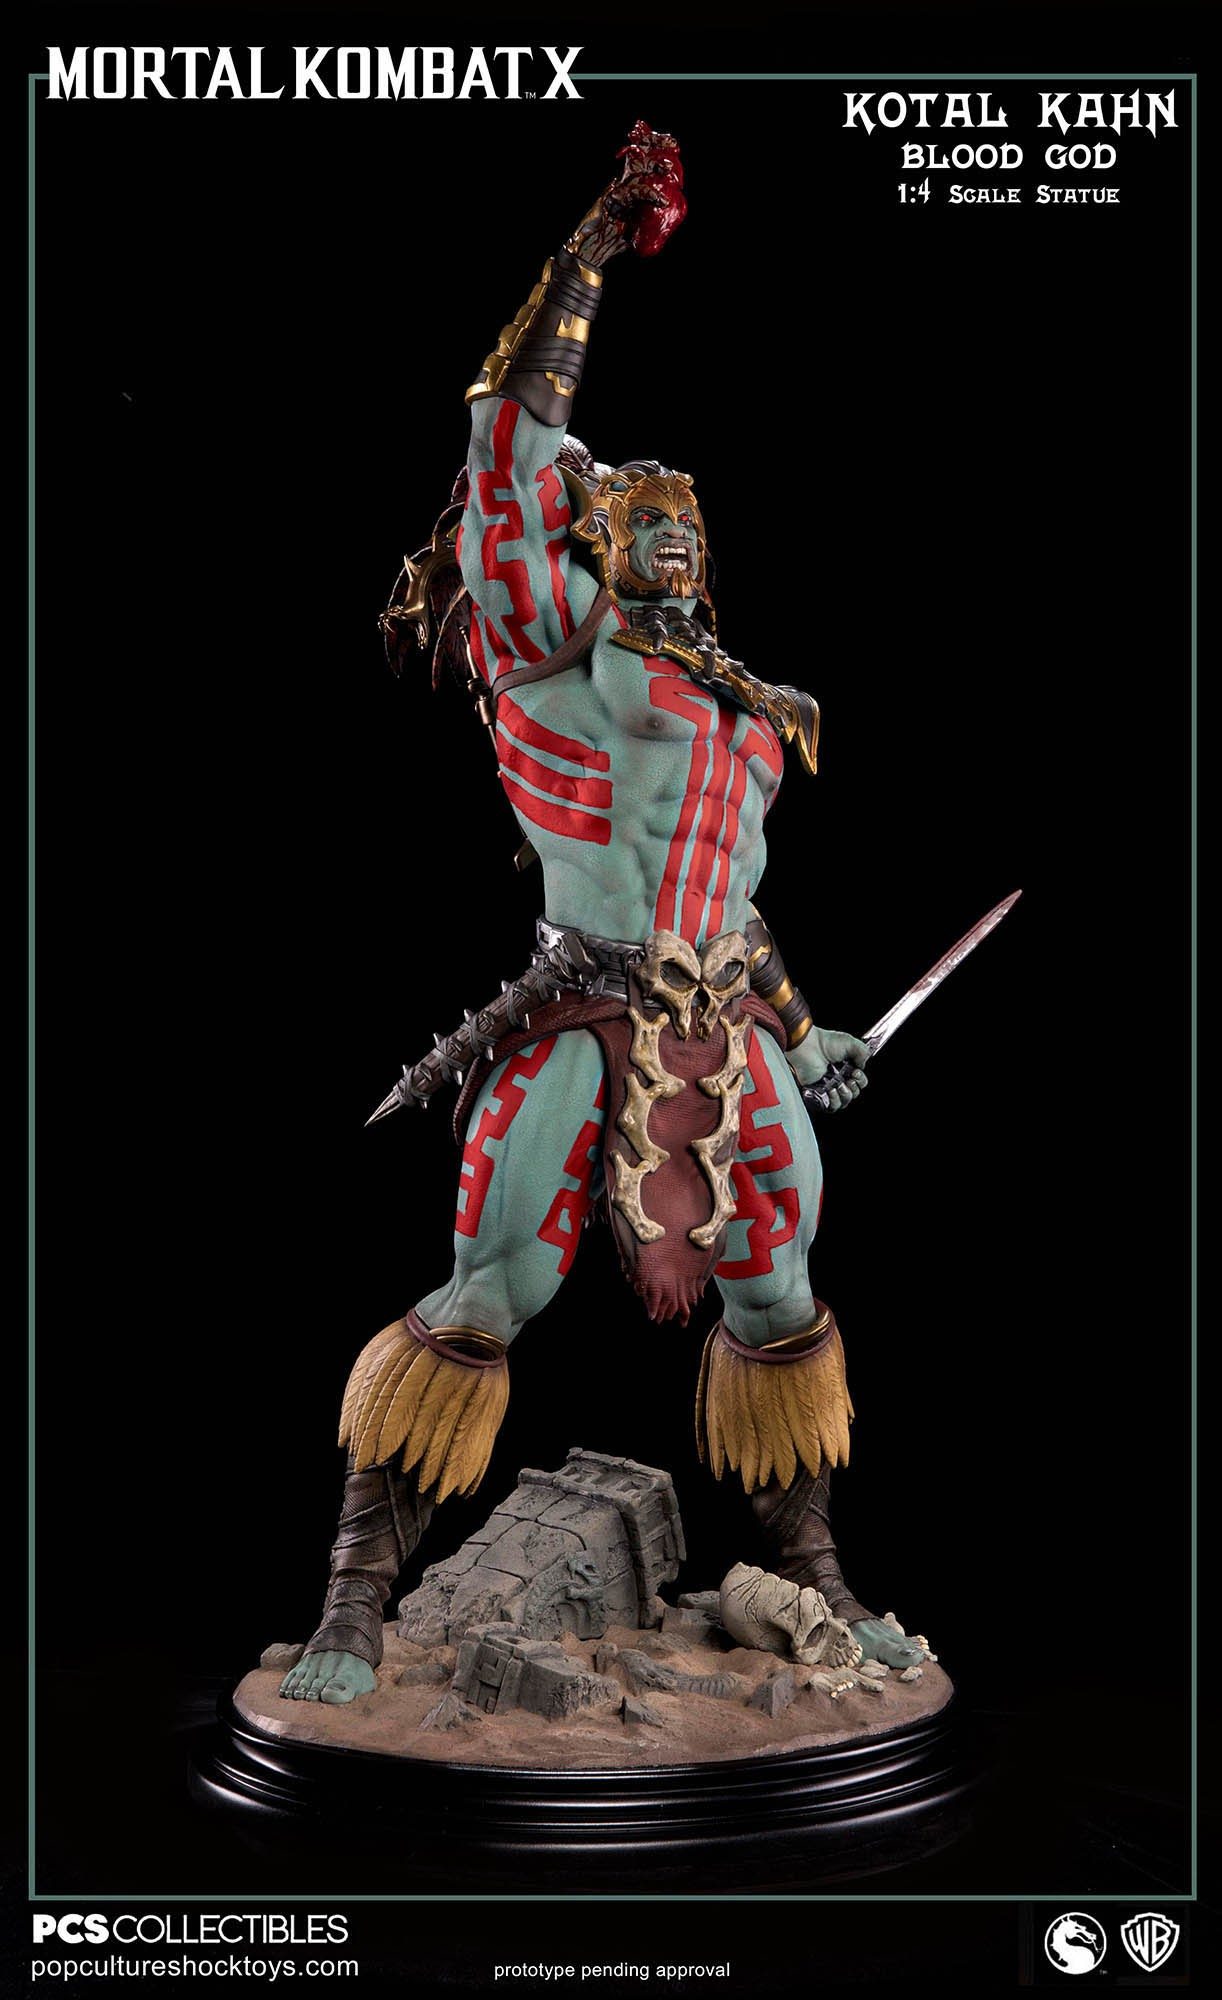 [Pop Culture Shock] Mortal Kombat X: Kotal Kahn 1:4 scale PCS-Kotal-Kahn-Blood-God-026